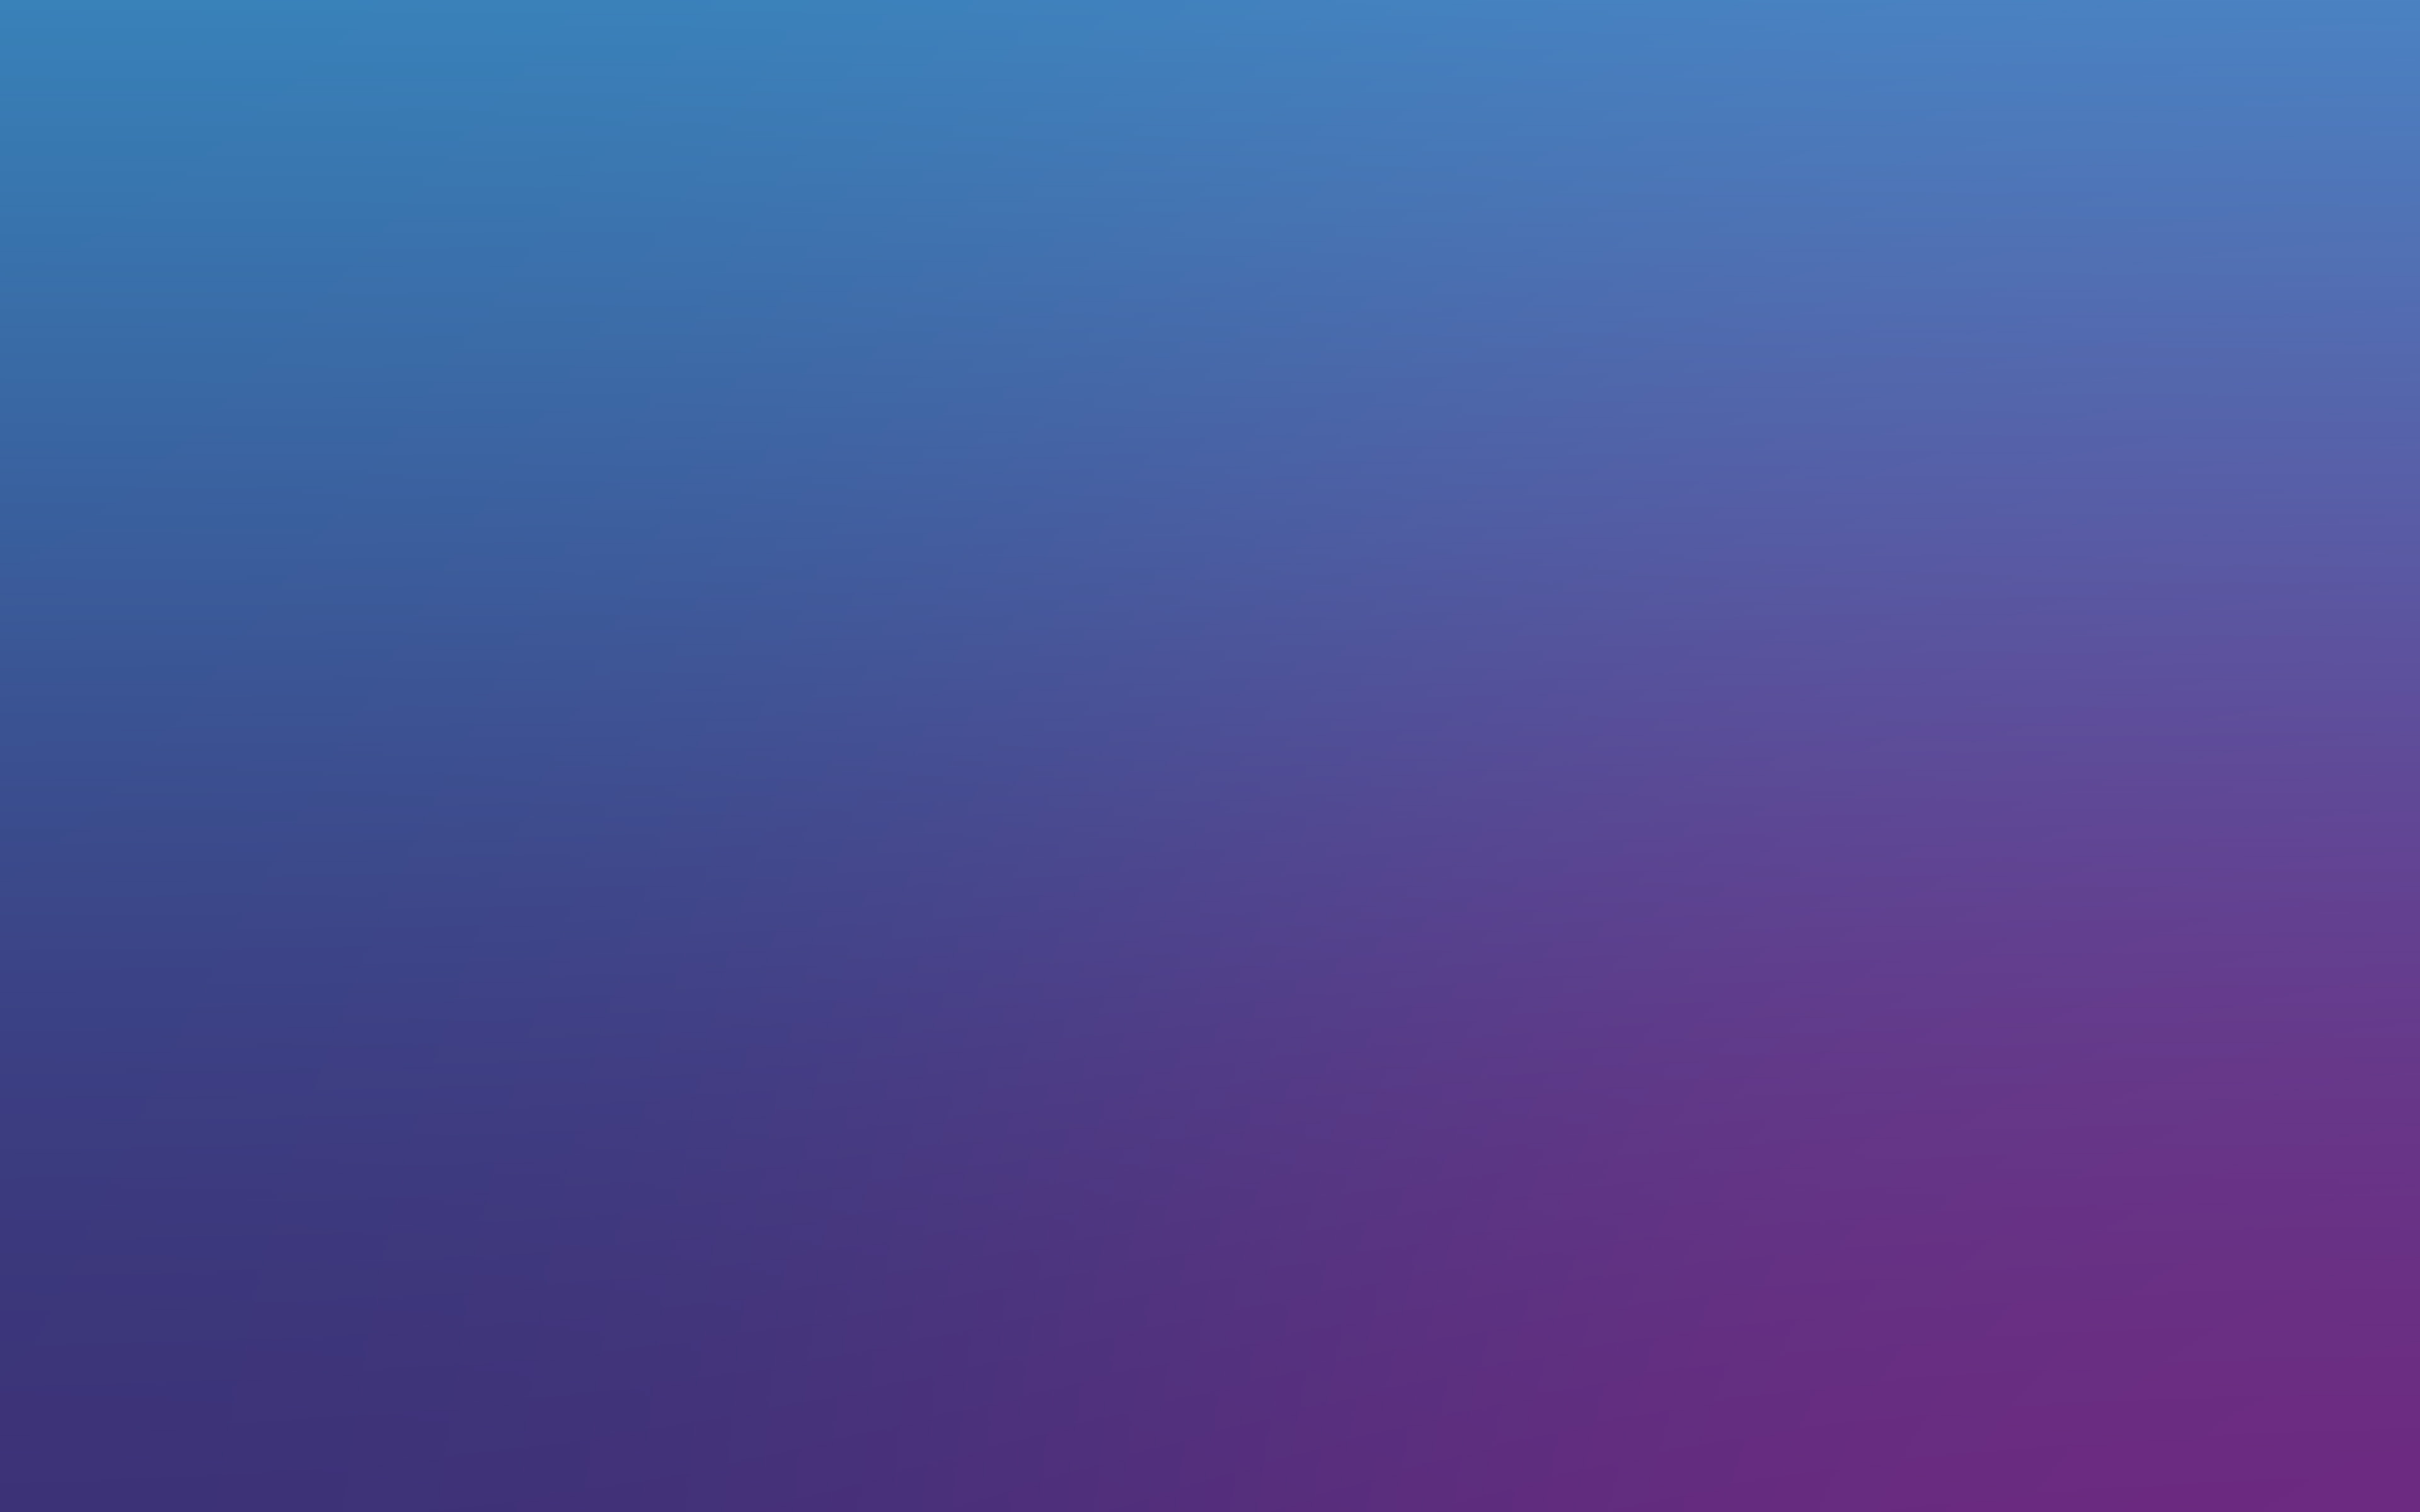 Sn57 Blue Purple Soft Blur Gradation Wallpaper